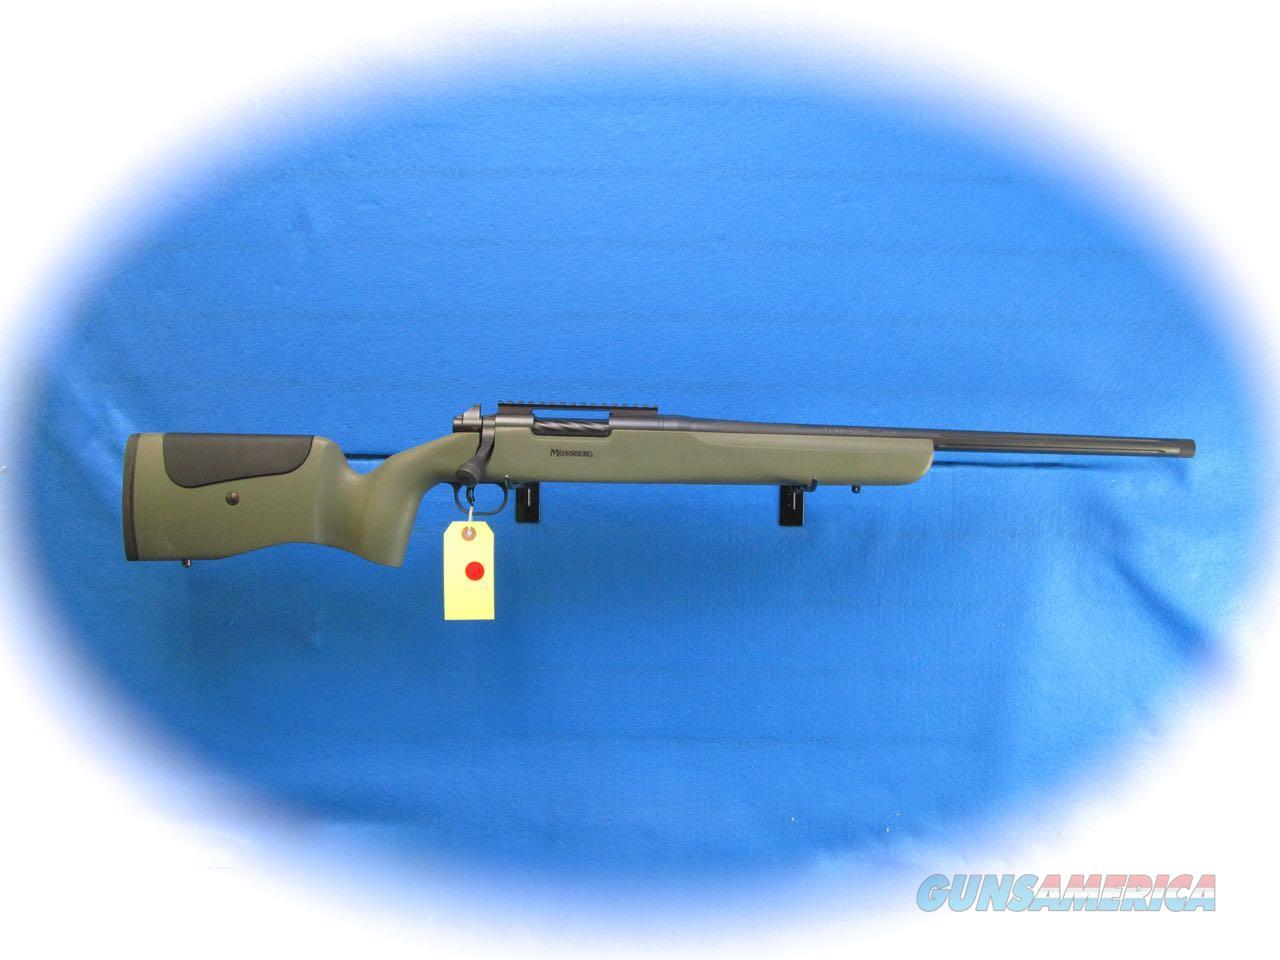 Mossberg MVP LR Bolt Action Rifle 6.5 Creedmoor Model 27784 **New**  Guns > Rifles > Mossberg Rifles > MVP